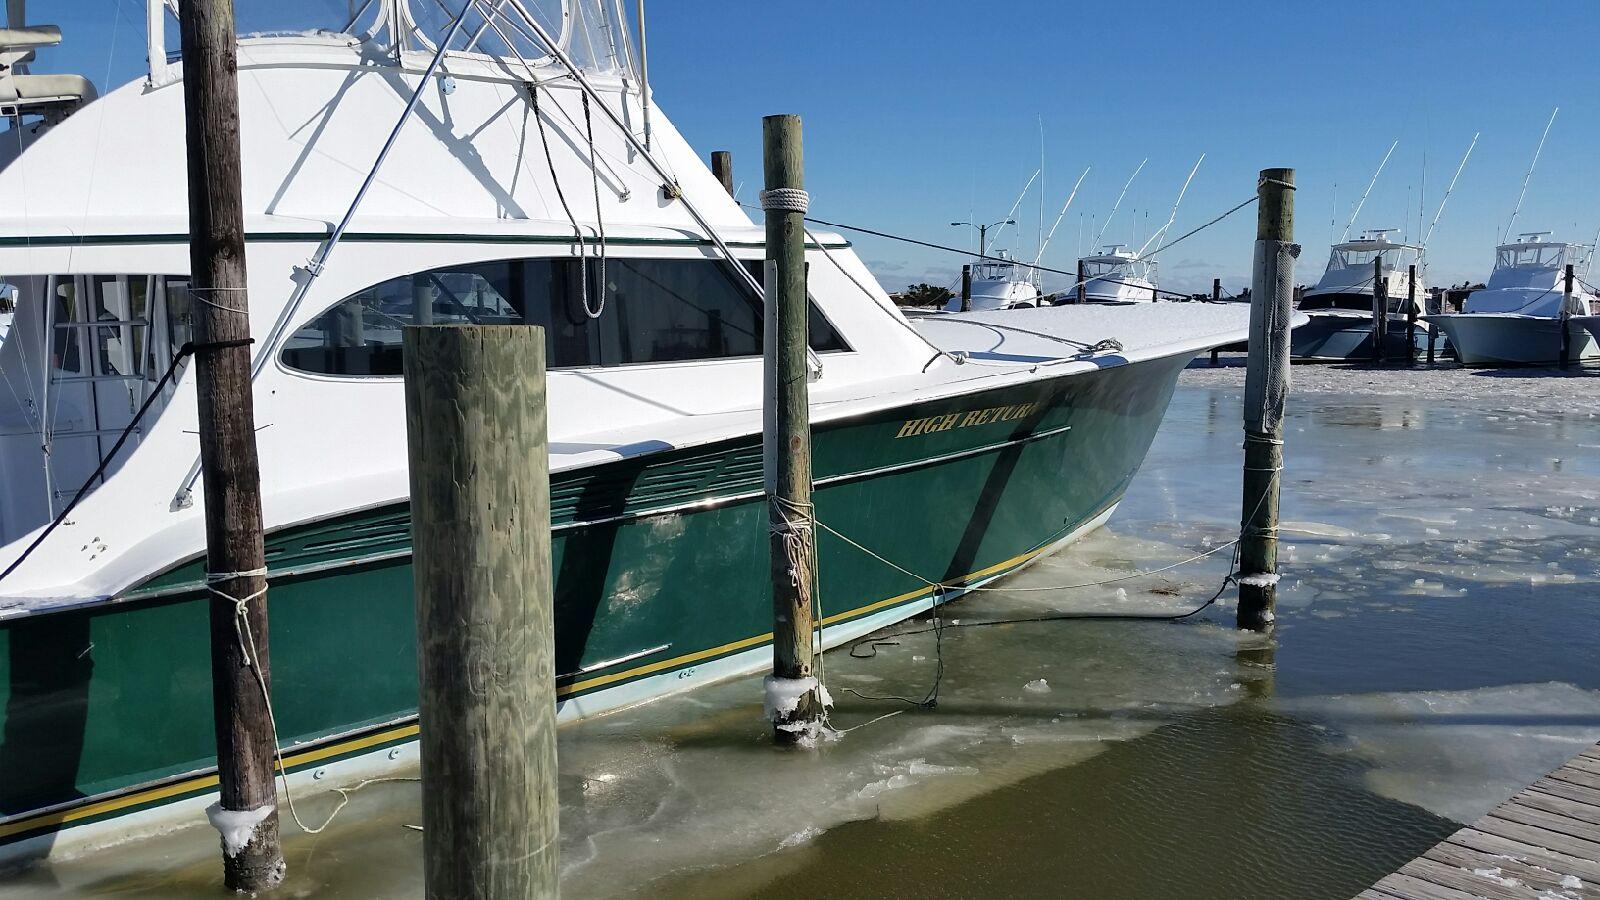 HR Ice Basin Boat2 - 1.2018.JPG